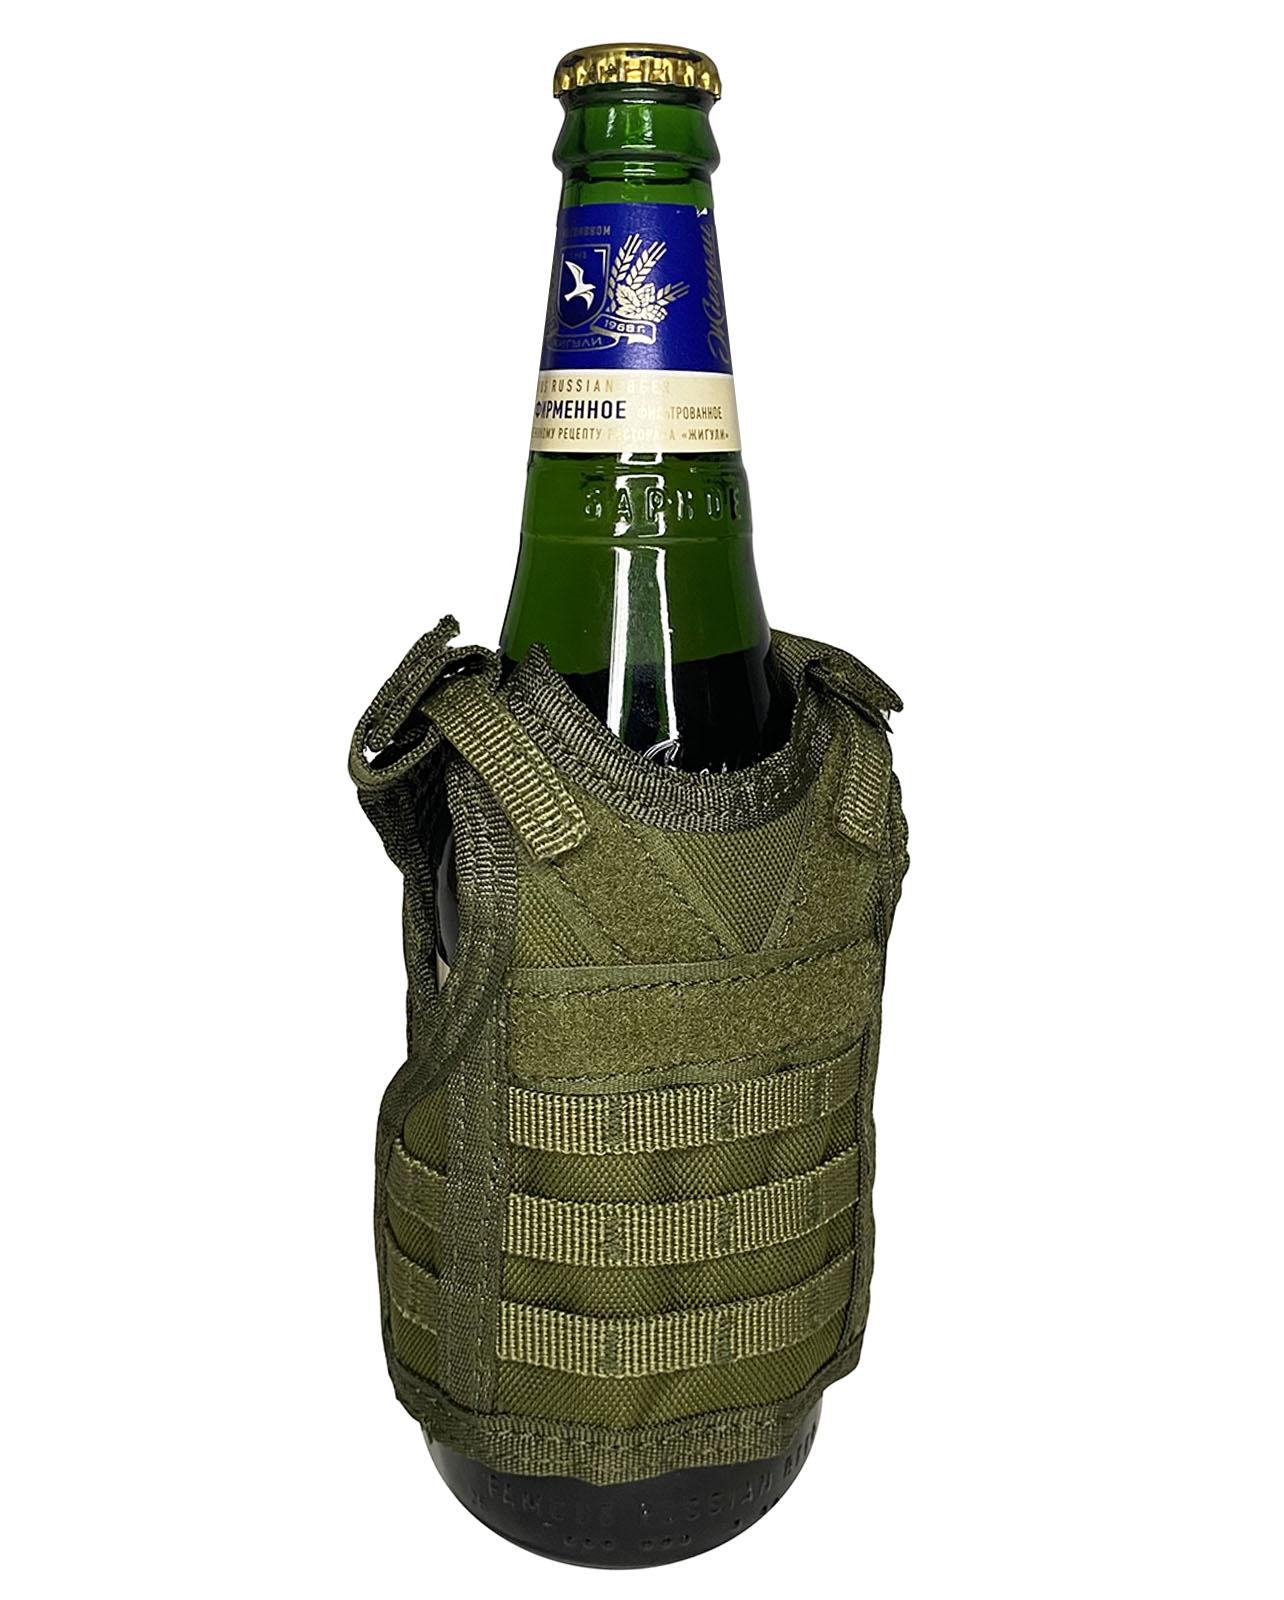 Защитный жилет на бутылки и банки (хаки-олива)